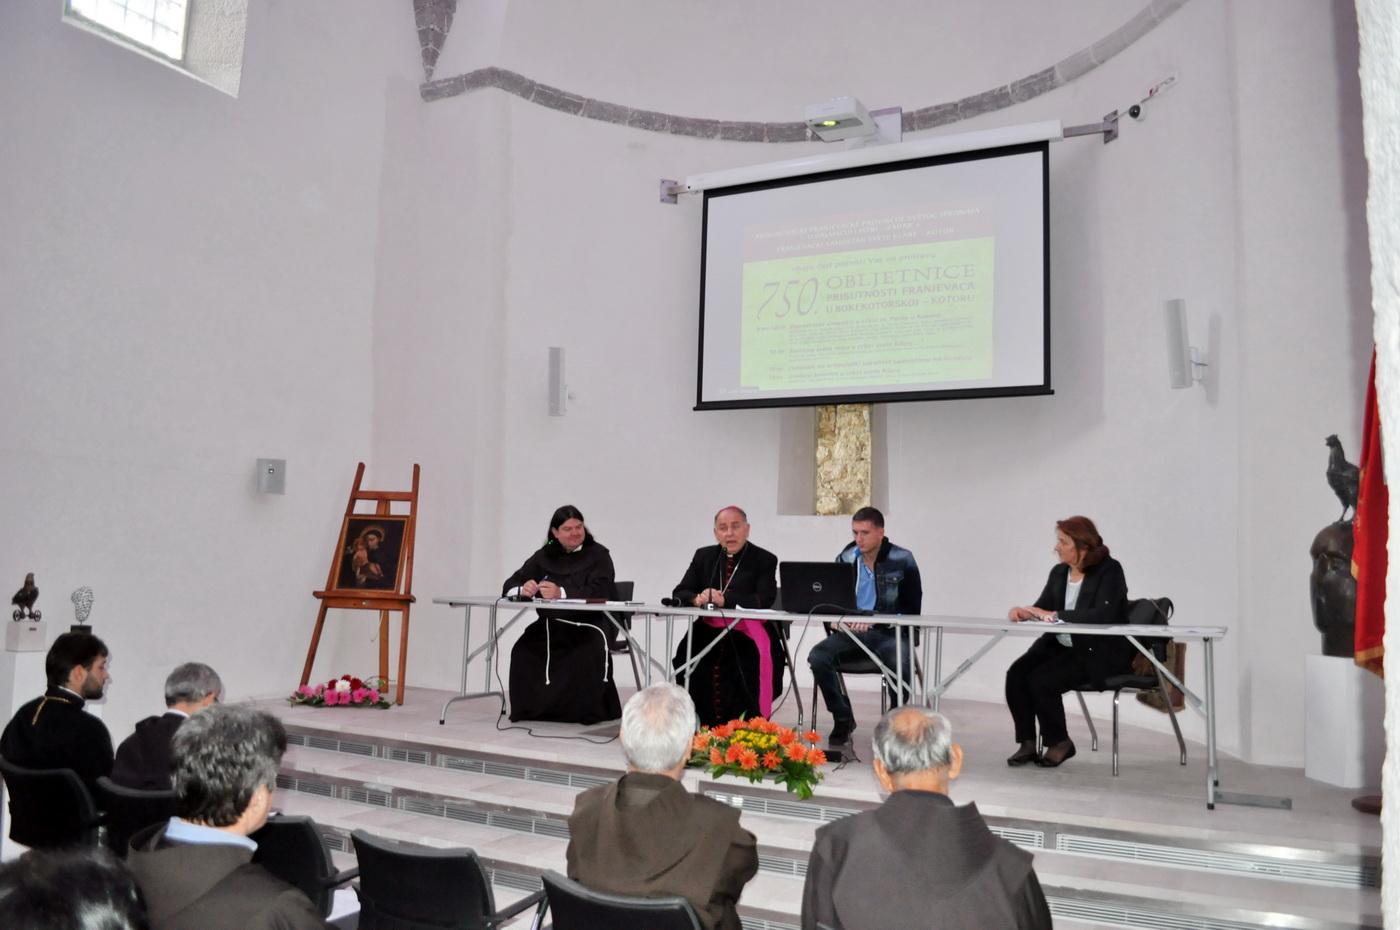 Franjevci 750 godina u Kotoru – naučni skup, proslava